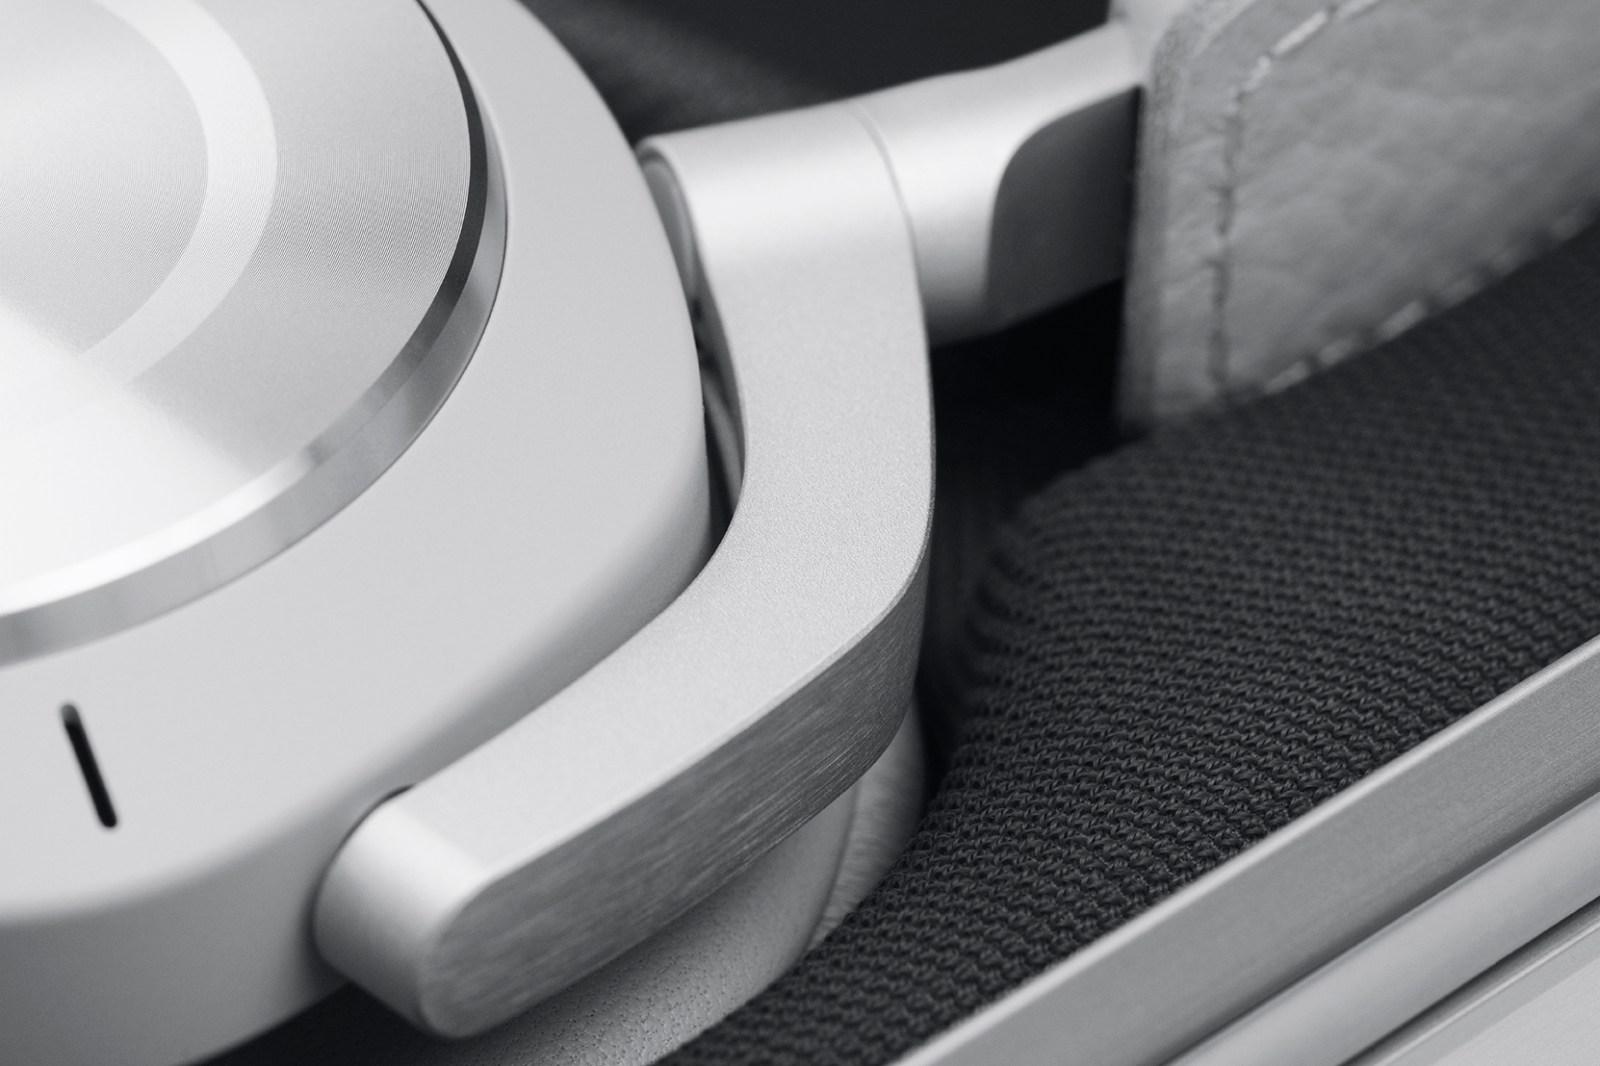 RIMOWA x Bang & Olufsen 全新聯乘 Beoplay H9i 無線藍牙耳機登場